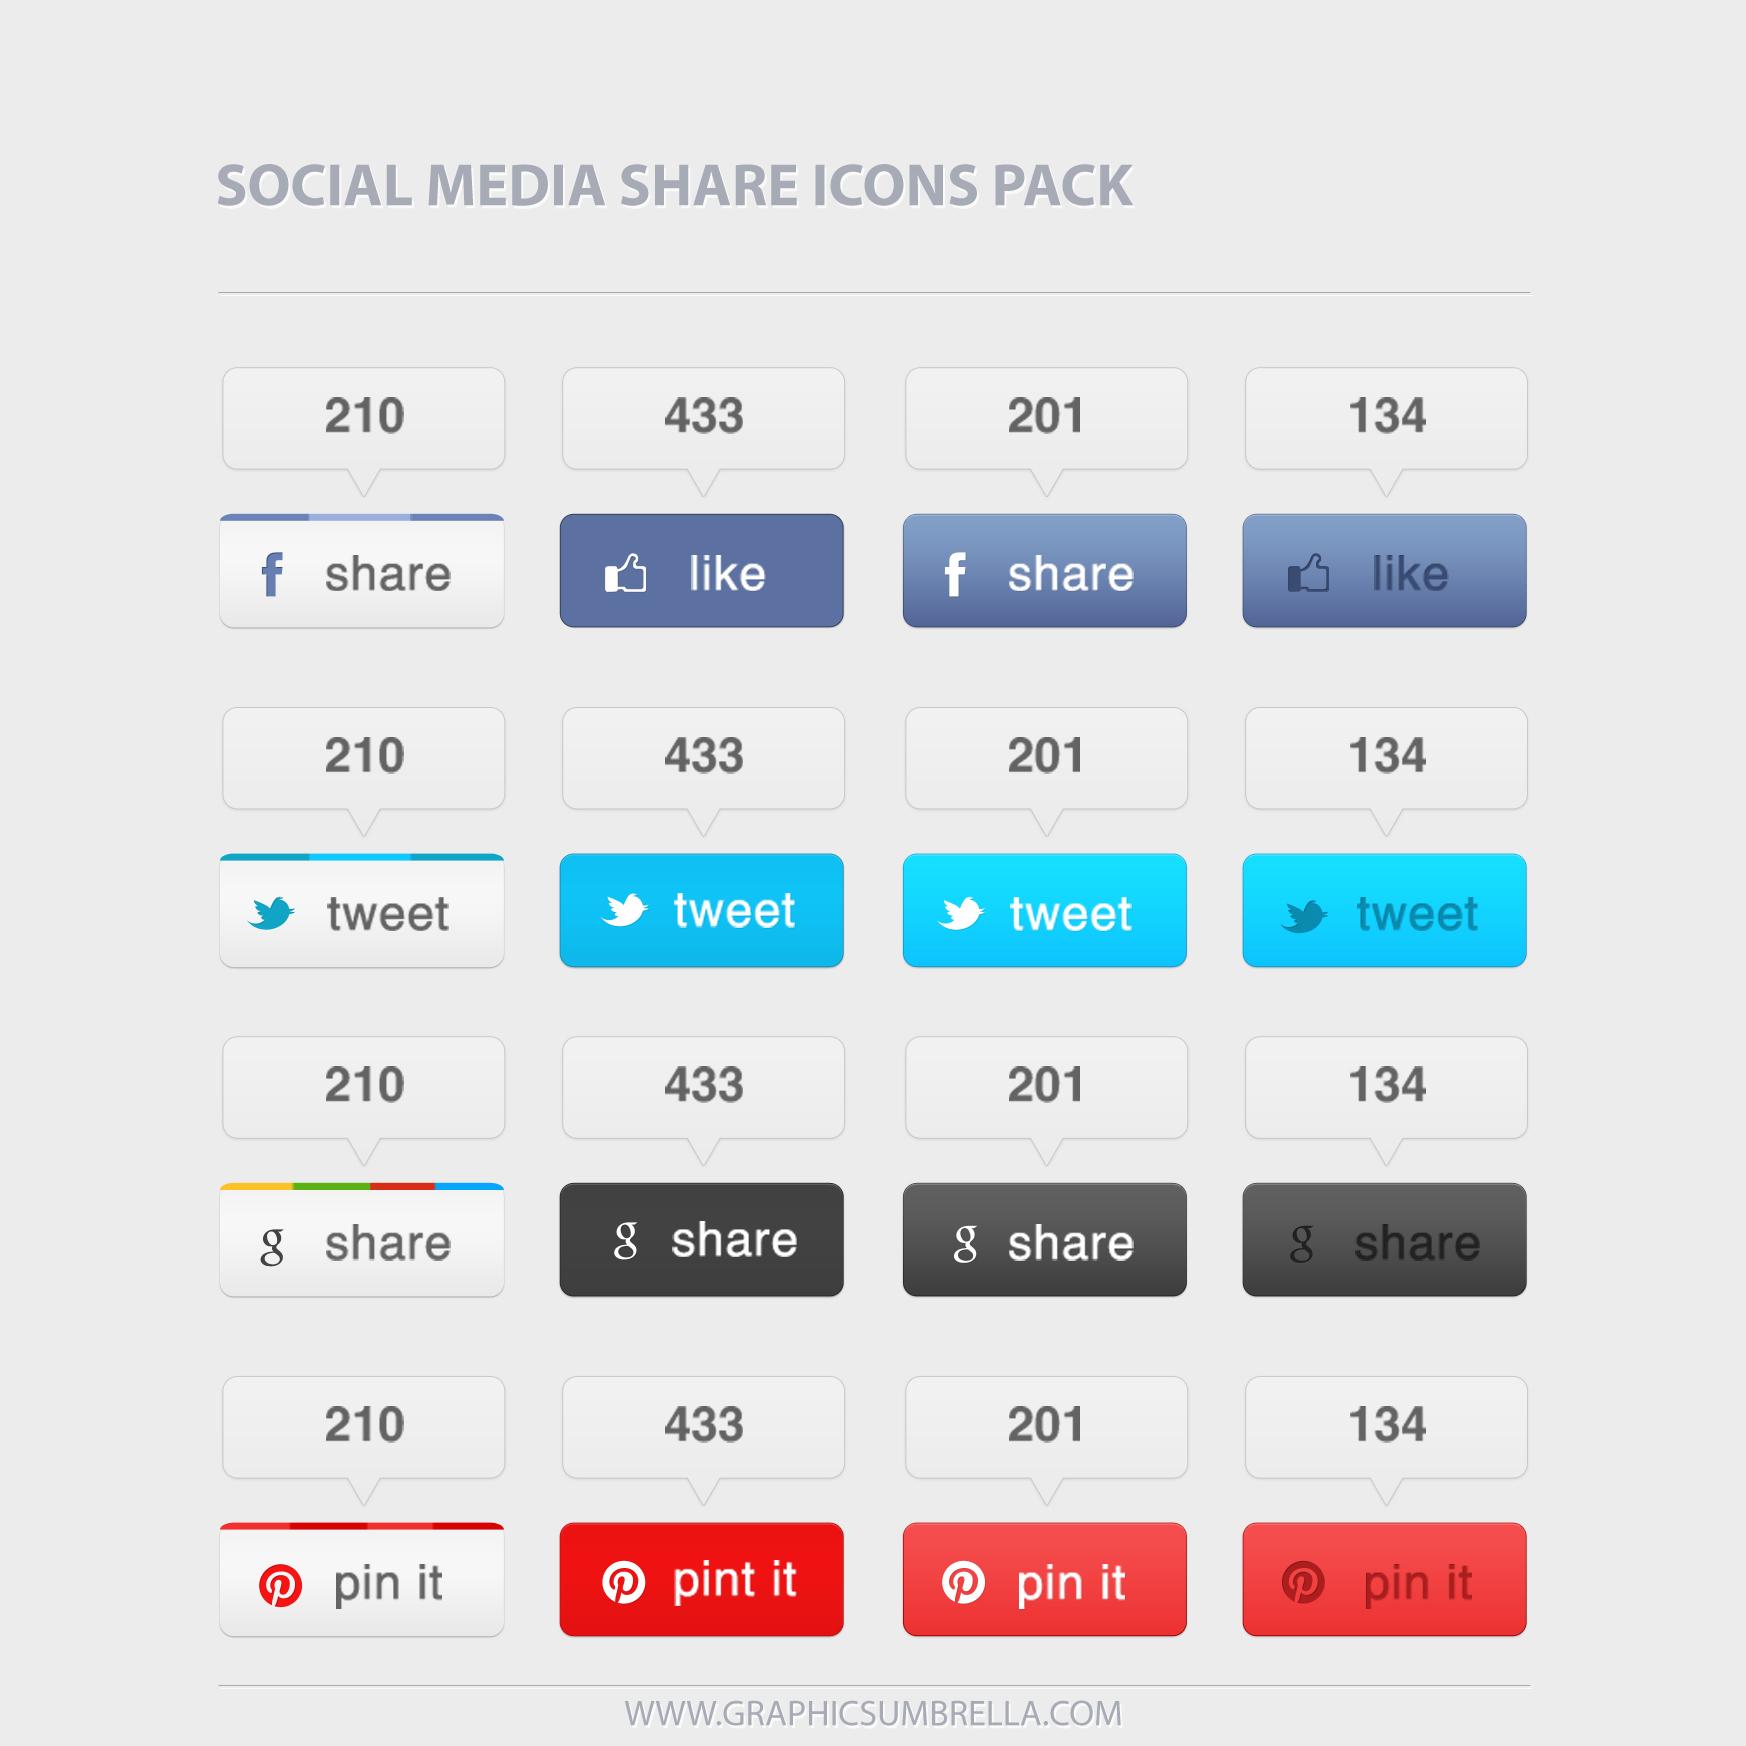 15 Social Media Sharing Icons Images